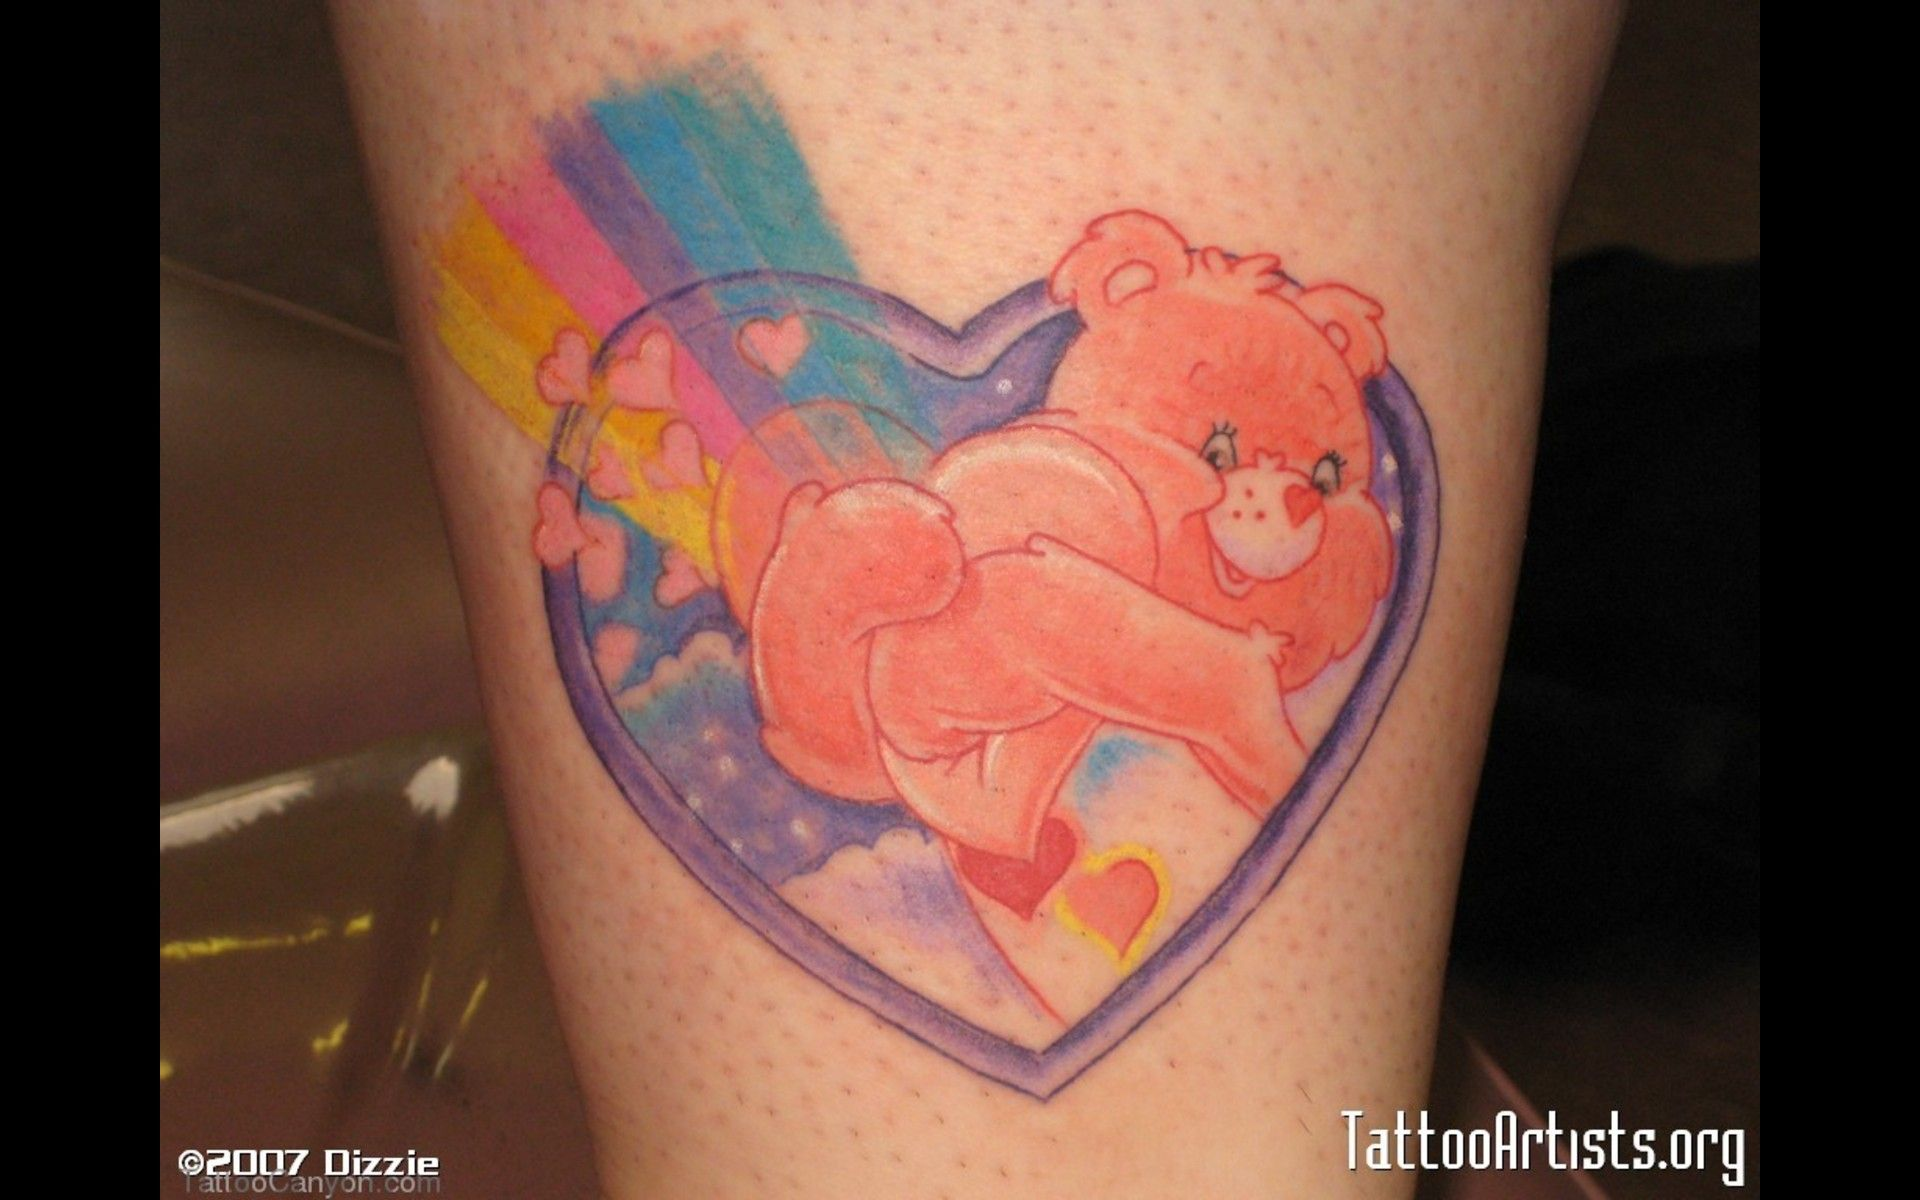 Care Bear Tattoo Artistsorg Picture 739 Care Bear Tattoos Bear Tattoo Designs Bear Tattoos